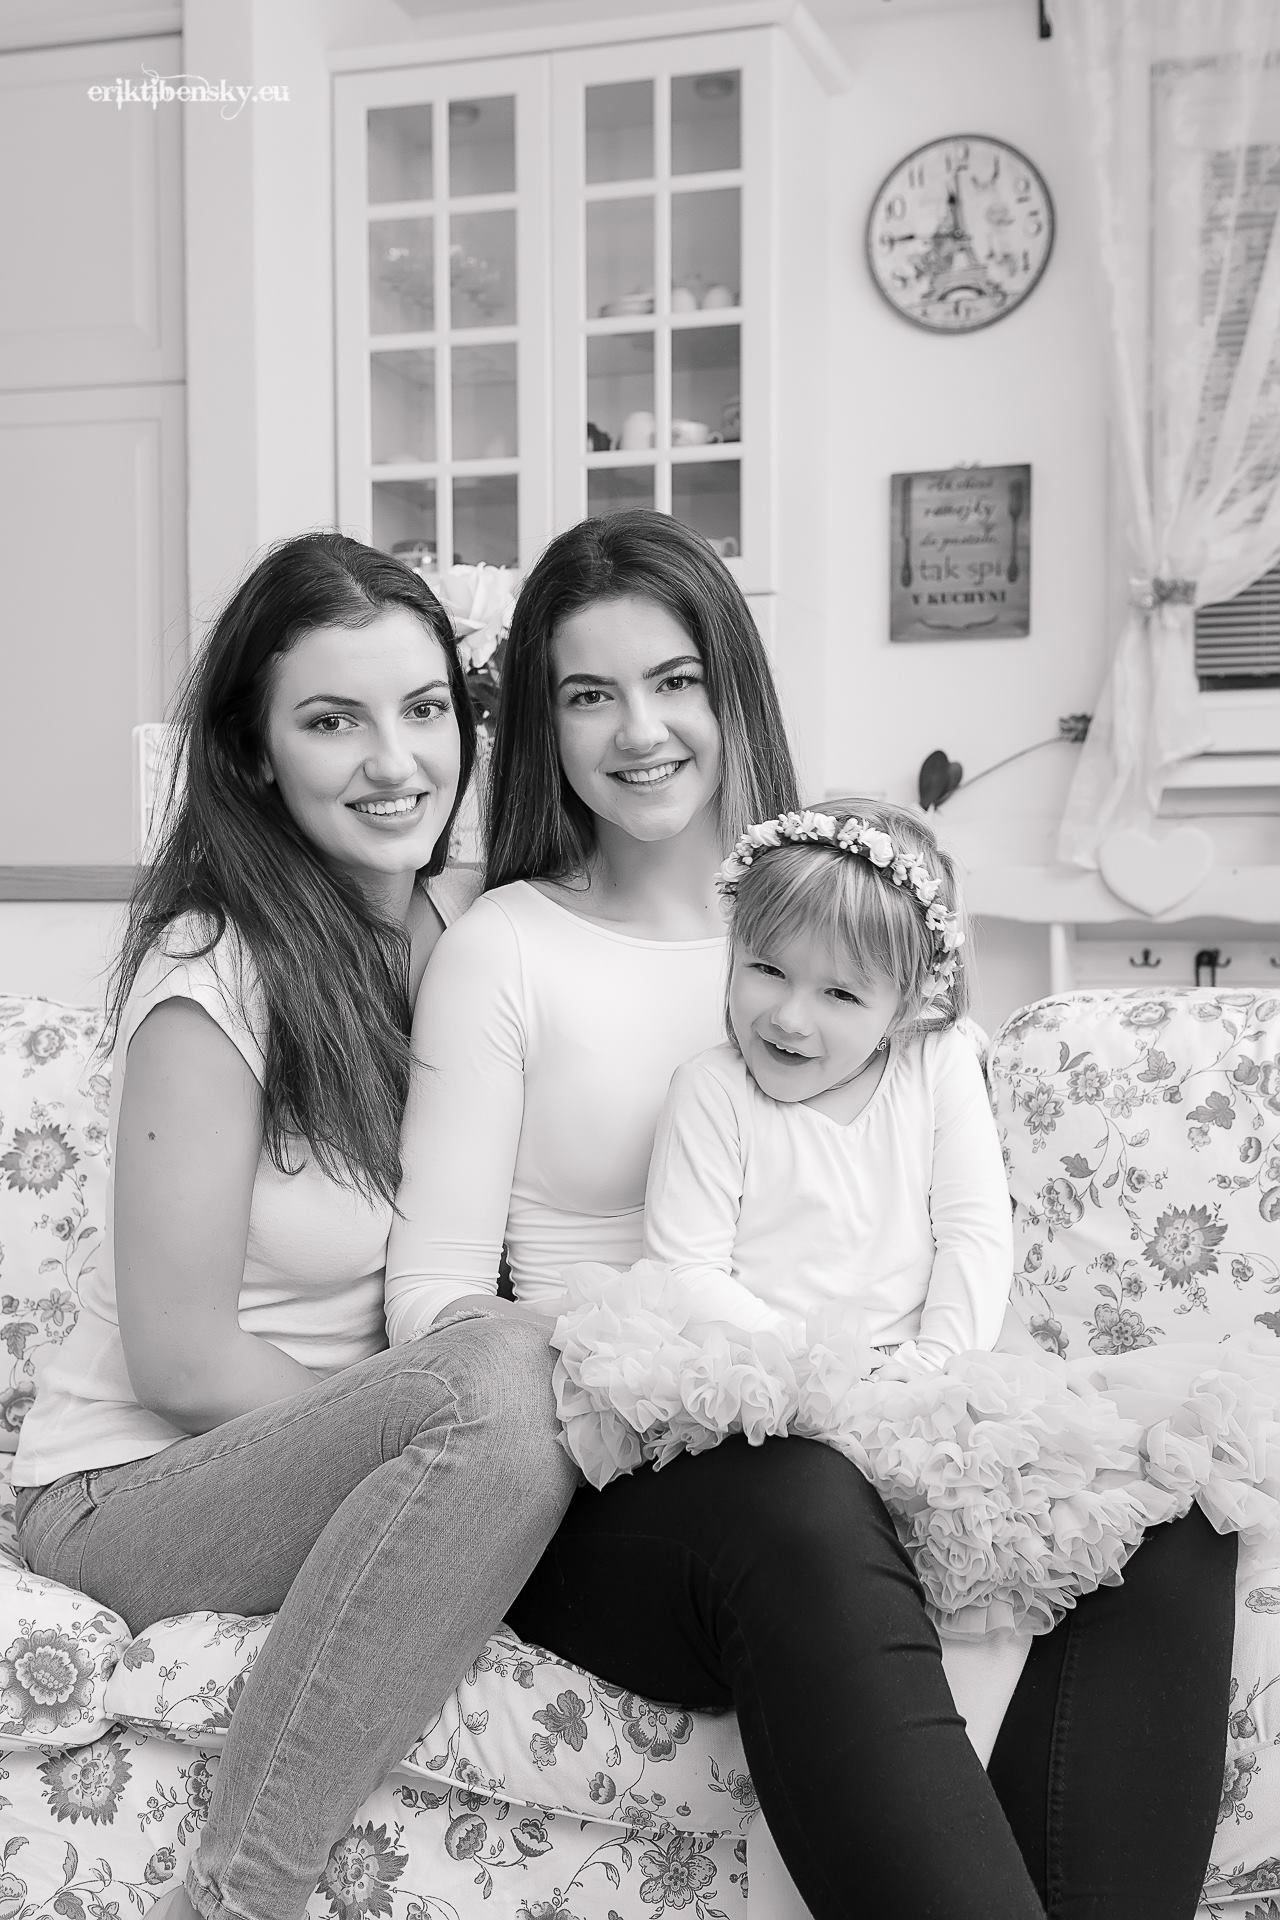 eriktibensky-eu-fotograf-home-photo-family-rodina-kids-deti-1013